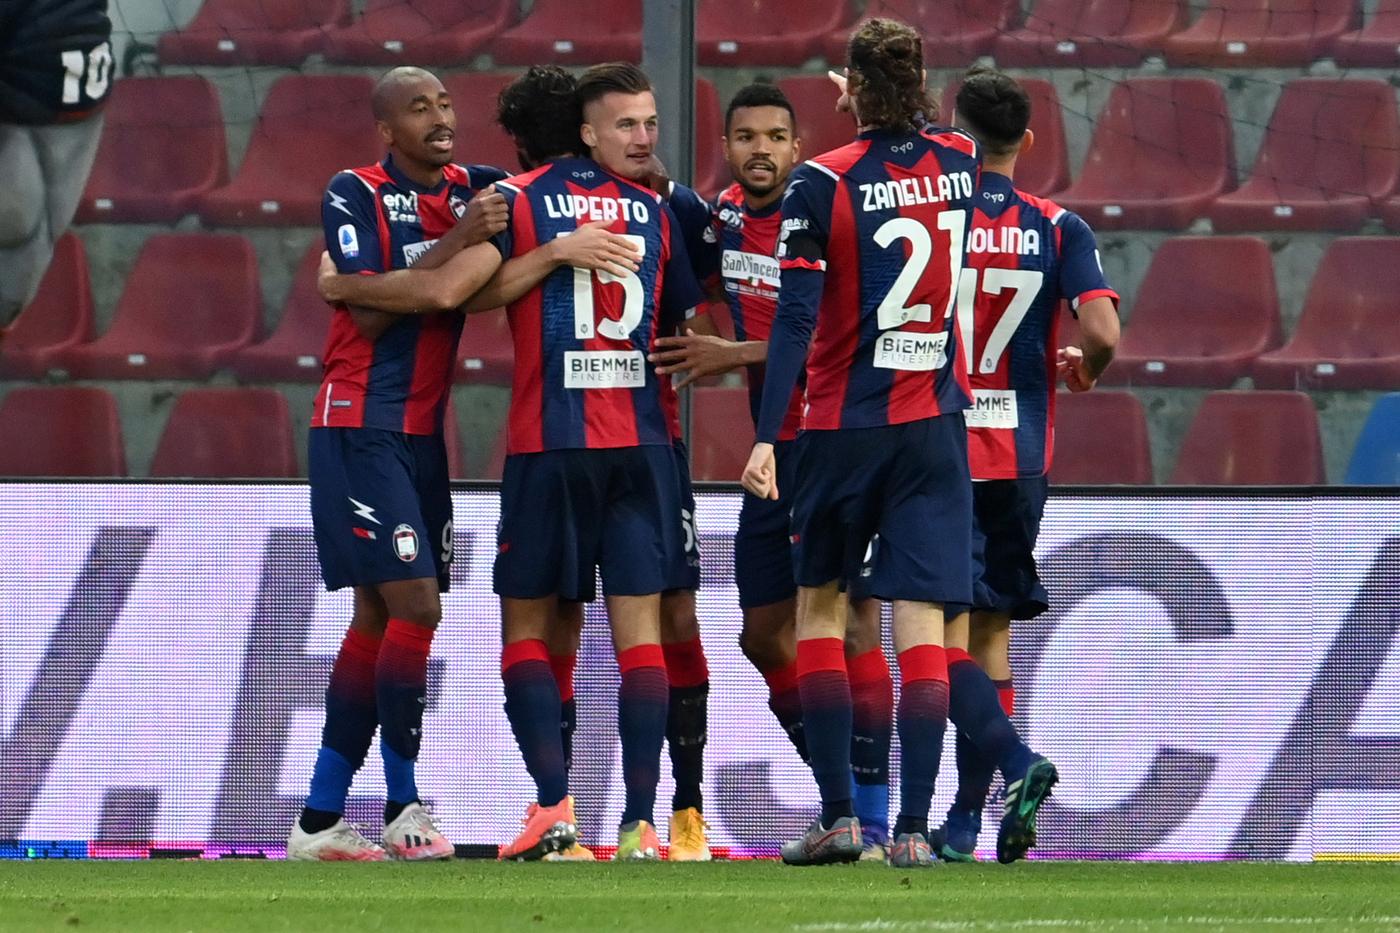 Crotone vs Spezia - Serie A TIM 2020/2021